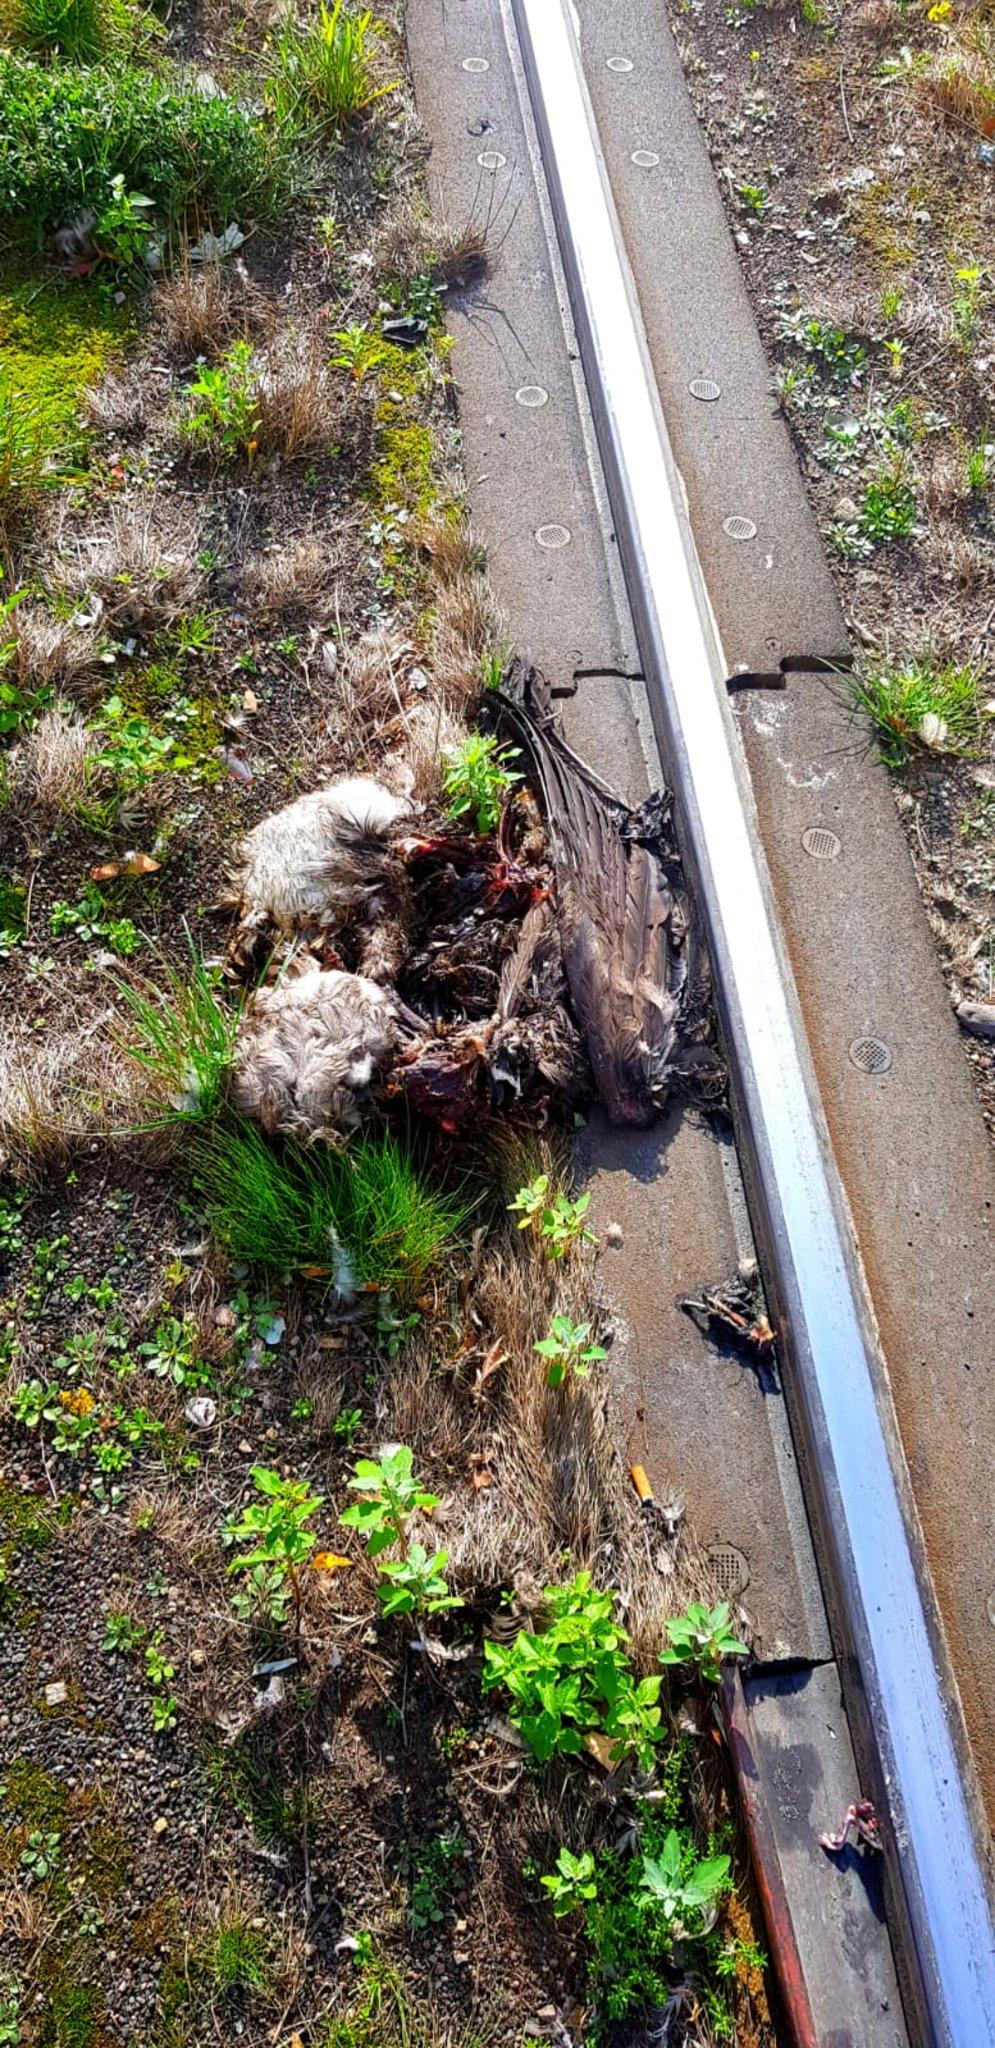 Rheinbahnunfälle mit Tieren - Düsseldorf - Lokalkompass.de